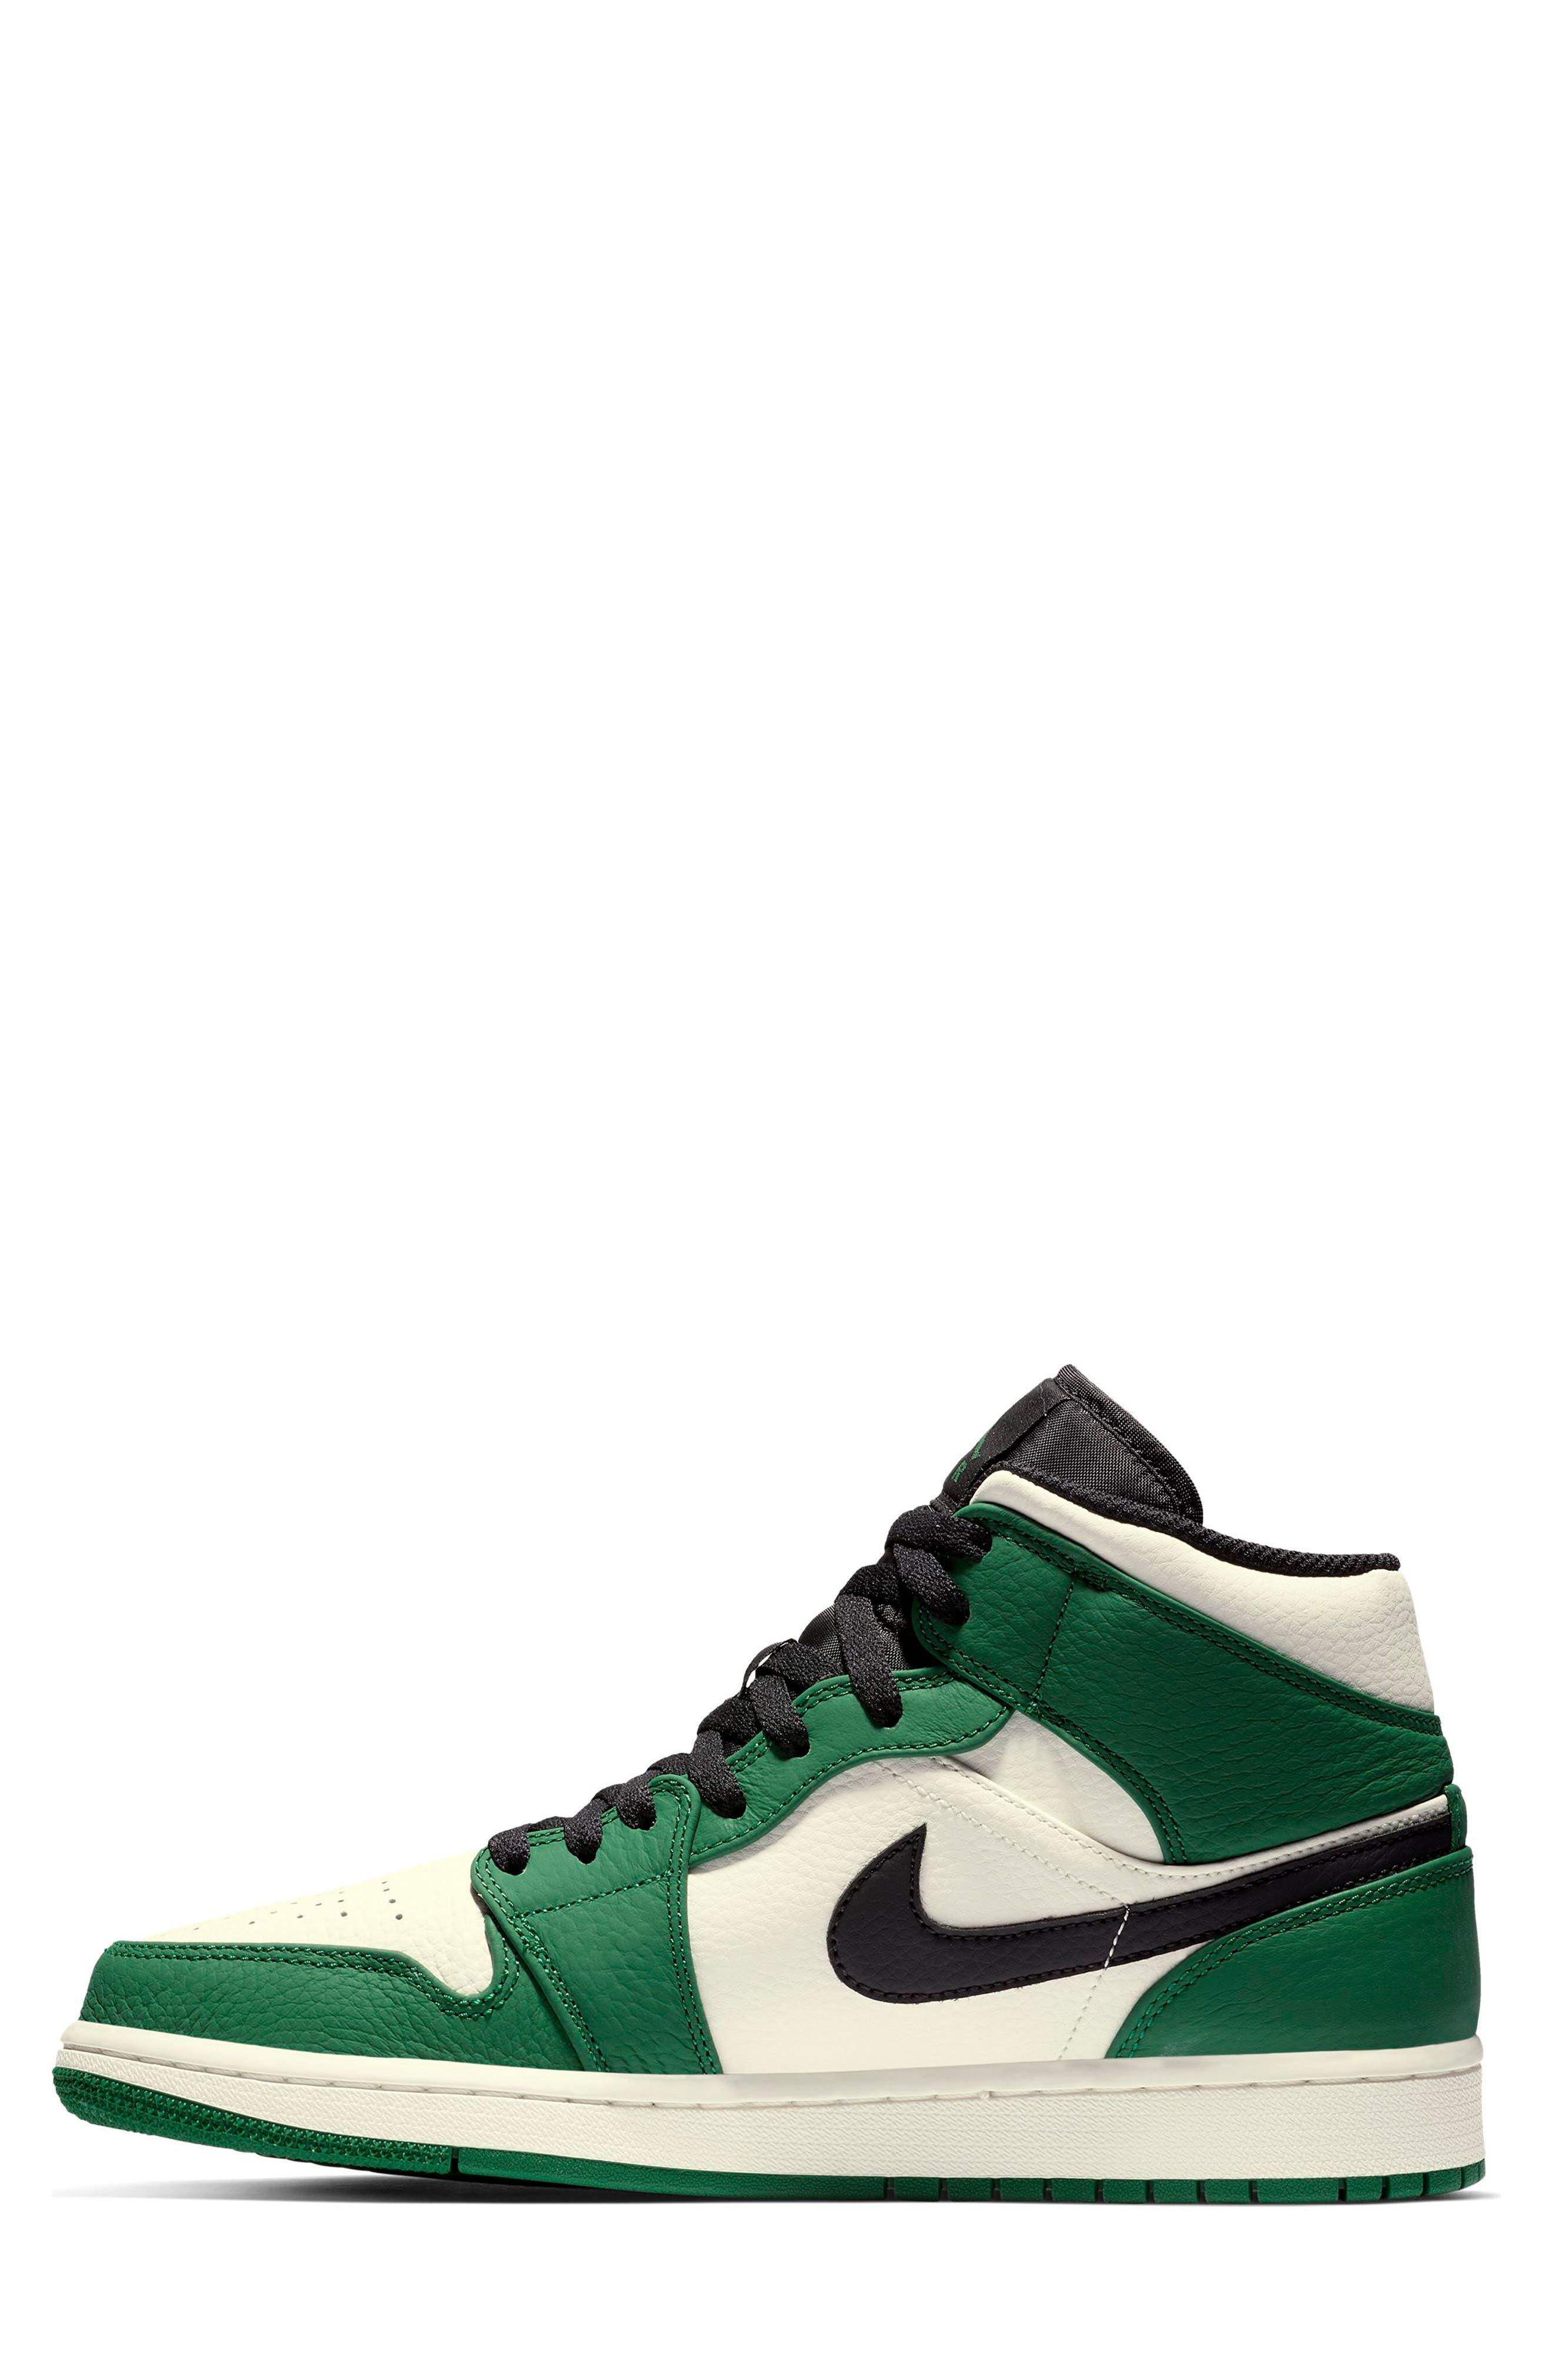 NIKE, Air Jordan 1 Mid Winterized Sneaker, Alternate thumbnail 7, color, 301